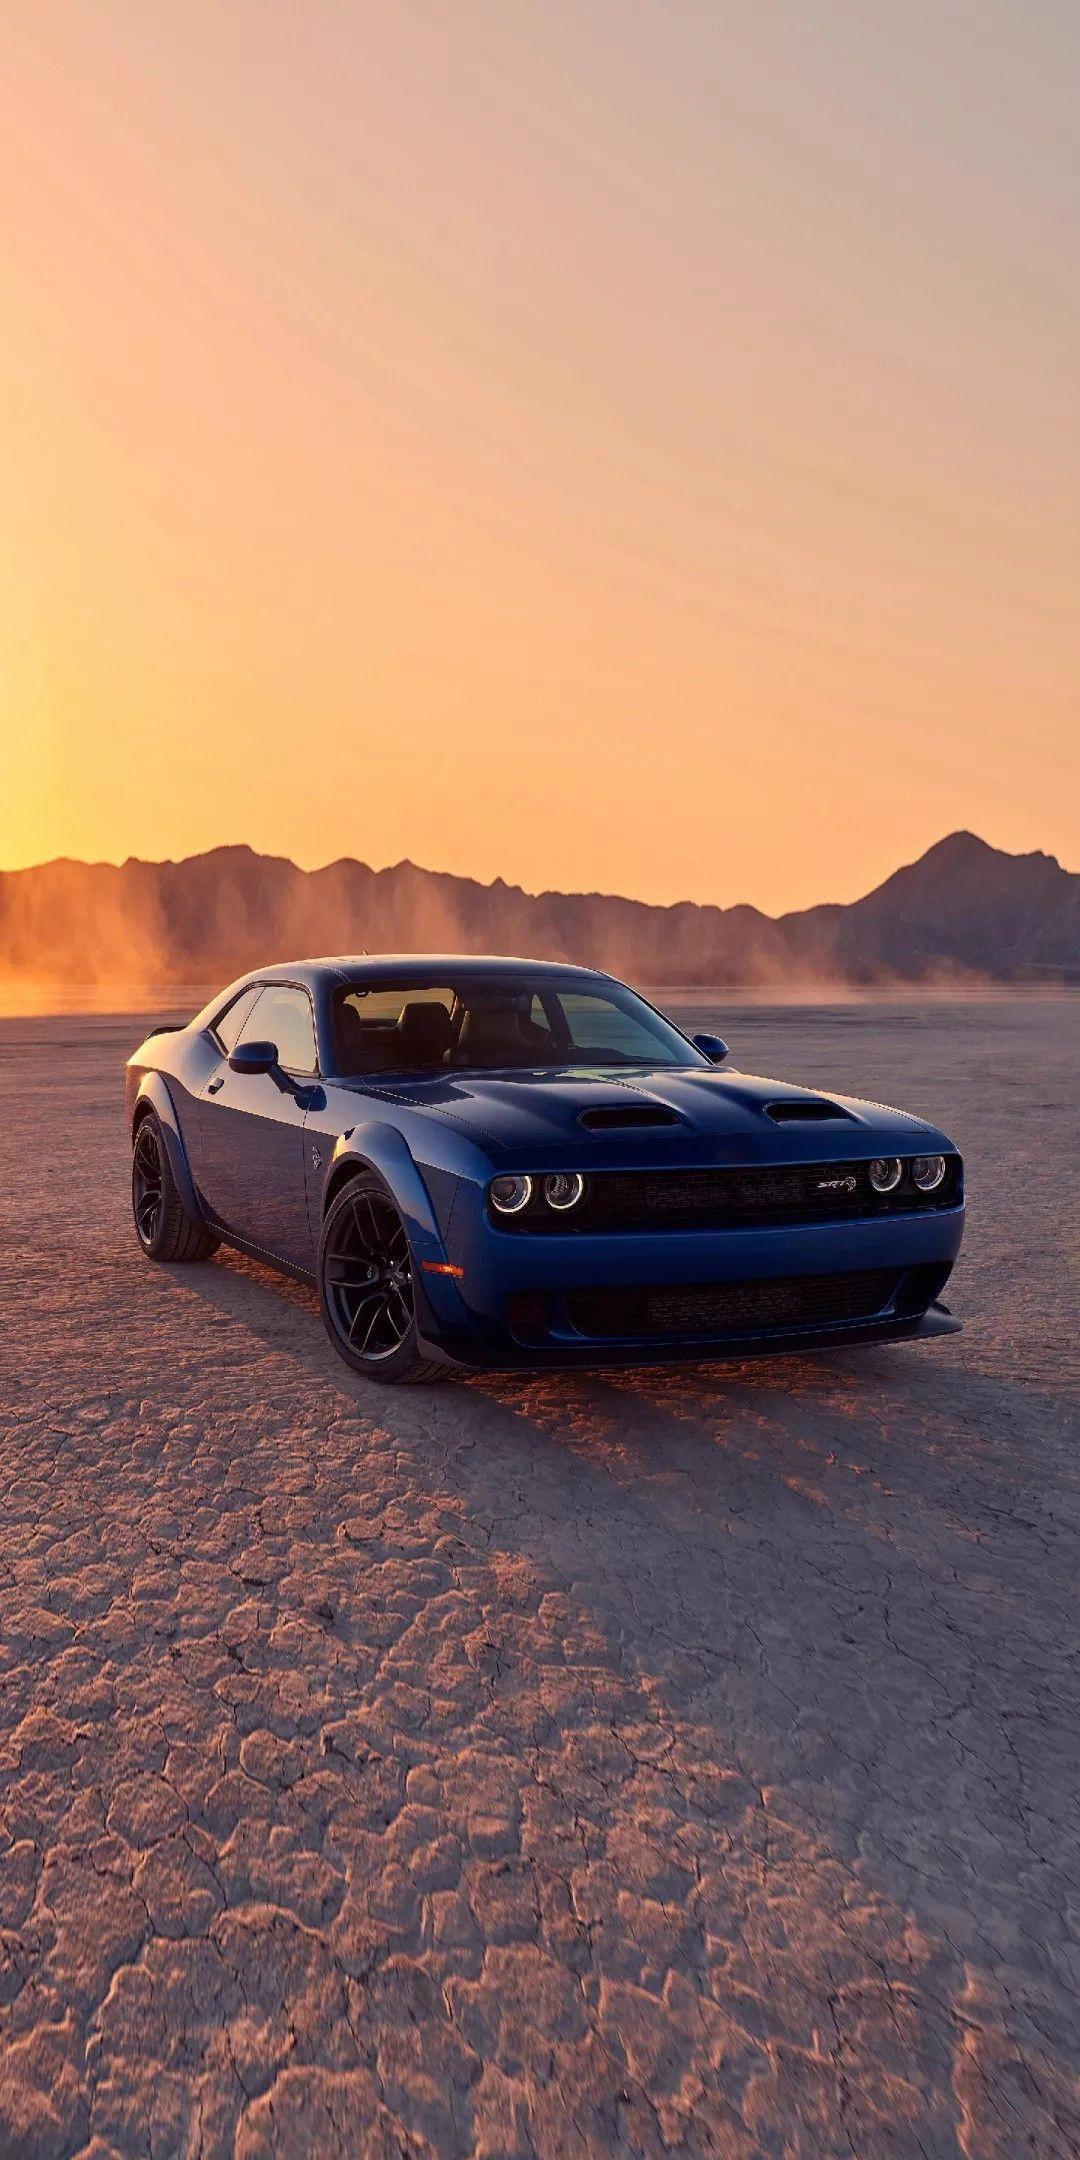 Pin By Shoshdeeb On خلفيات In 2020 Dodge Challenger Dodge Challenger Srt Hellcat Dodge Challenger Srt